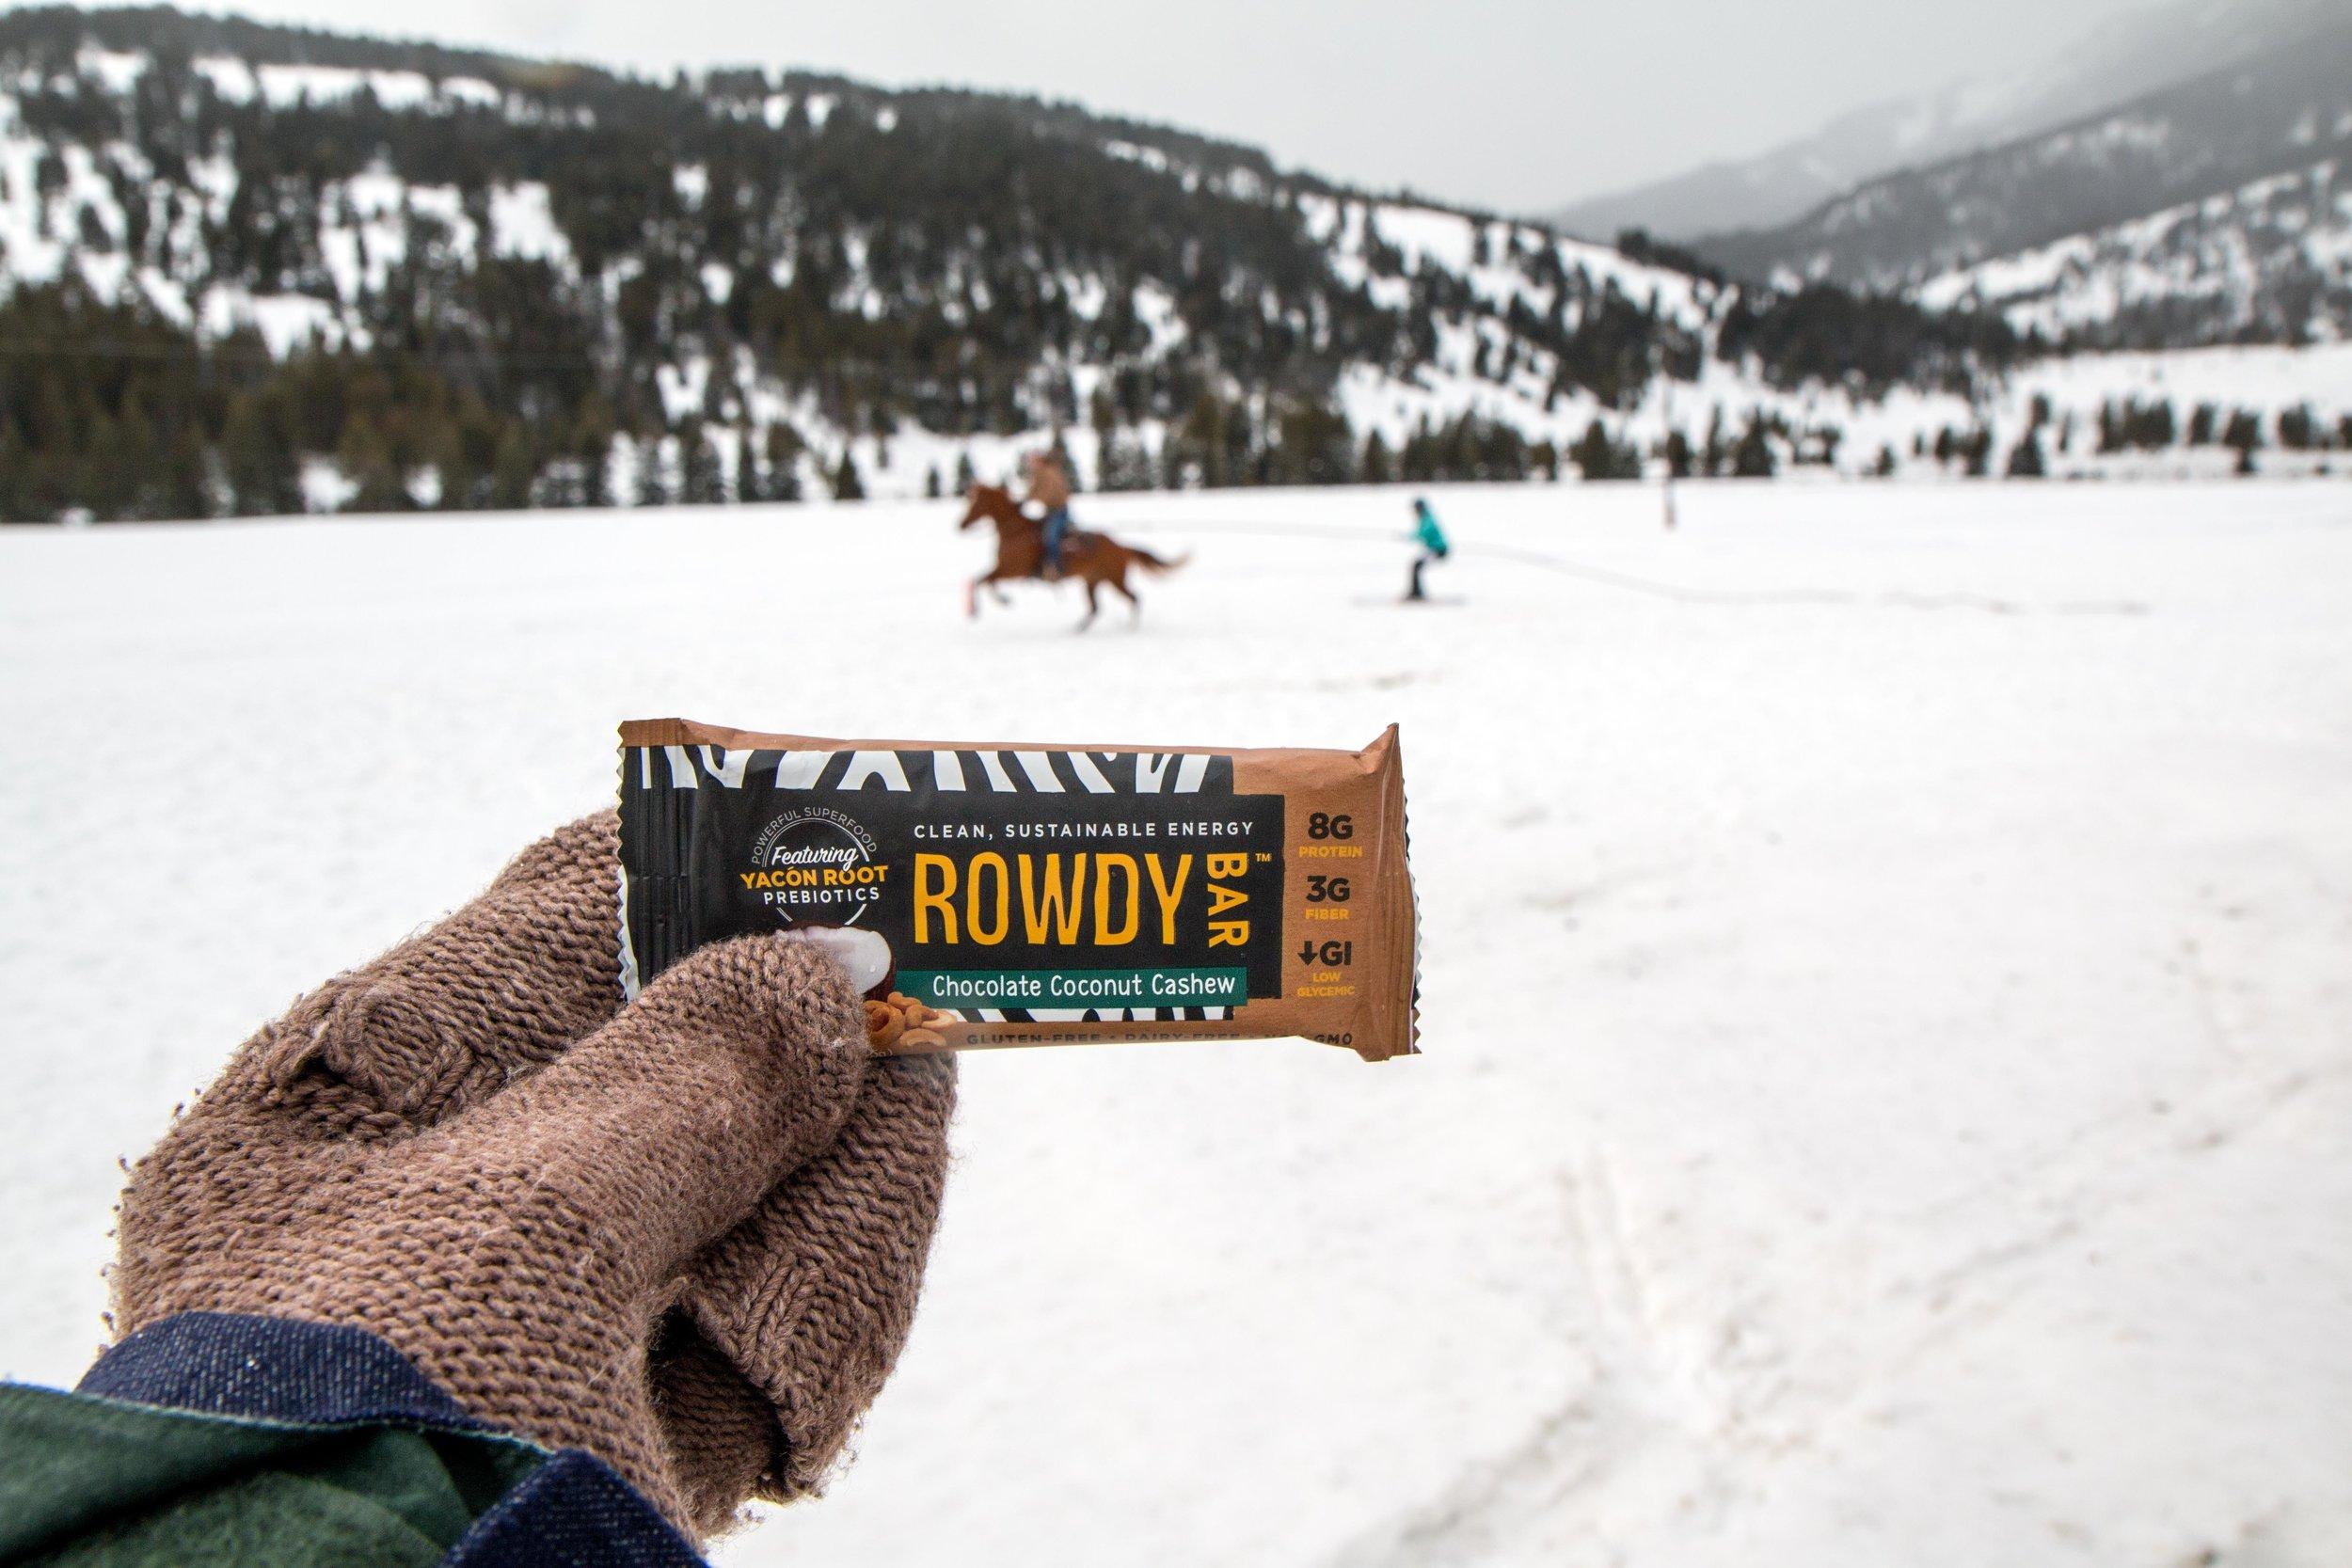 Rowdy Prebiotic Chocolate Coconut Cashew Bars